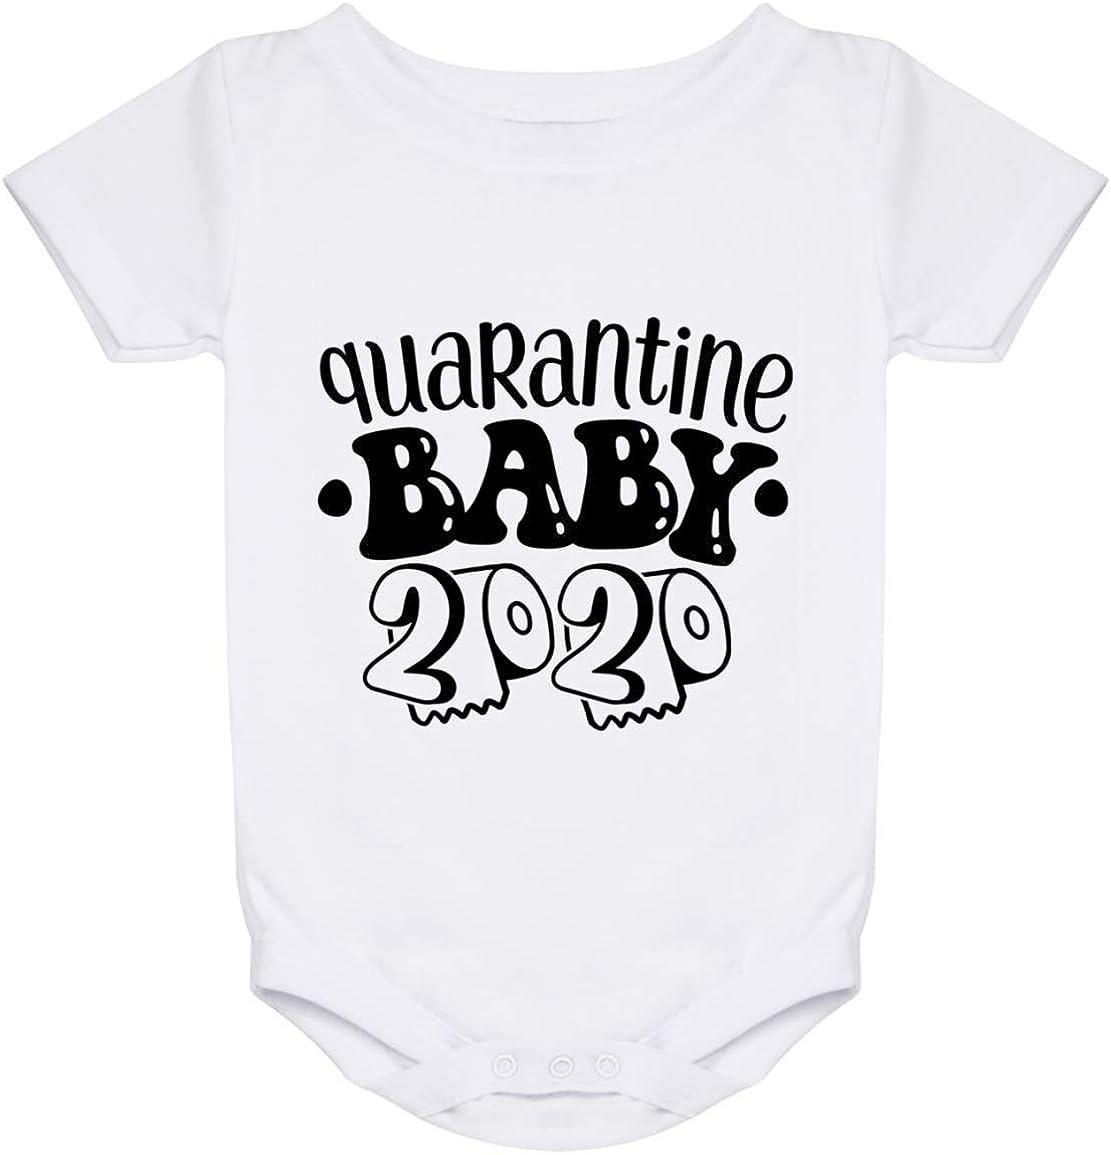 Quarantine Baby Romper Covid Baby Baby Quarantine fail Quarantine baby clothes Quarantine Baby Shirt Covid Baby Shirt Because Quarantine